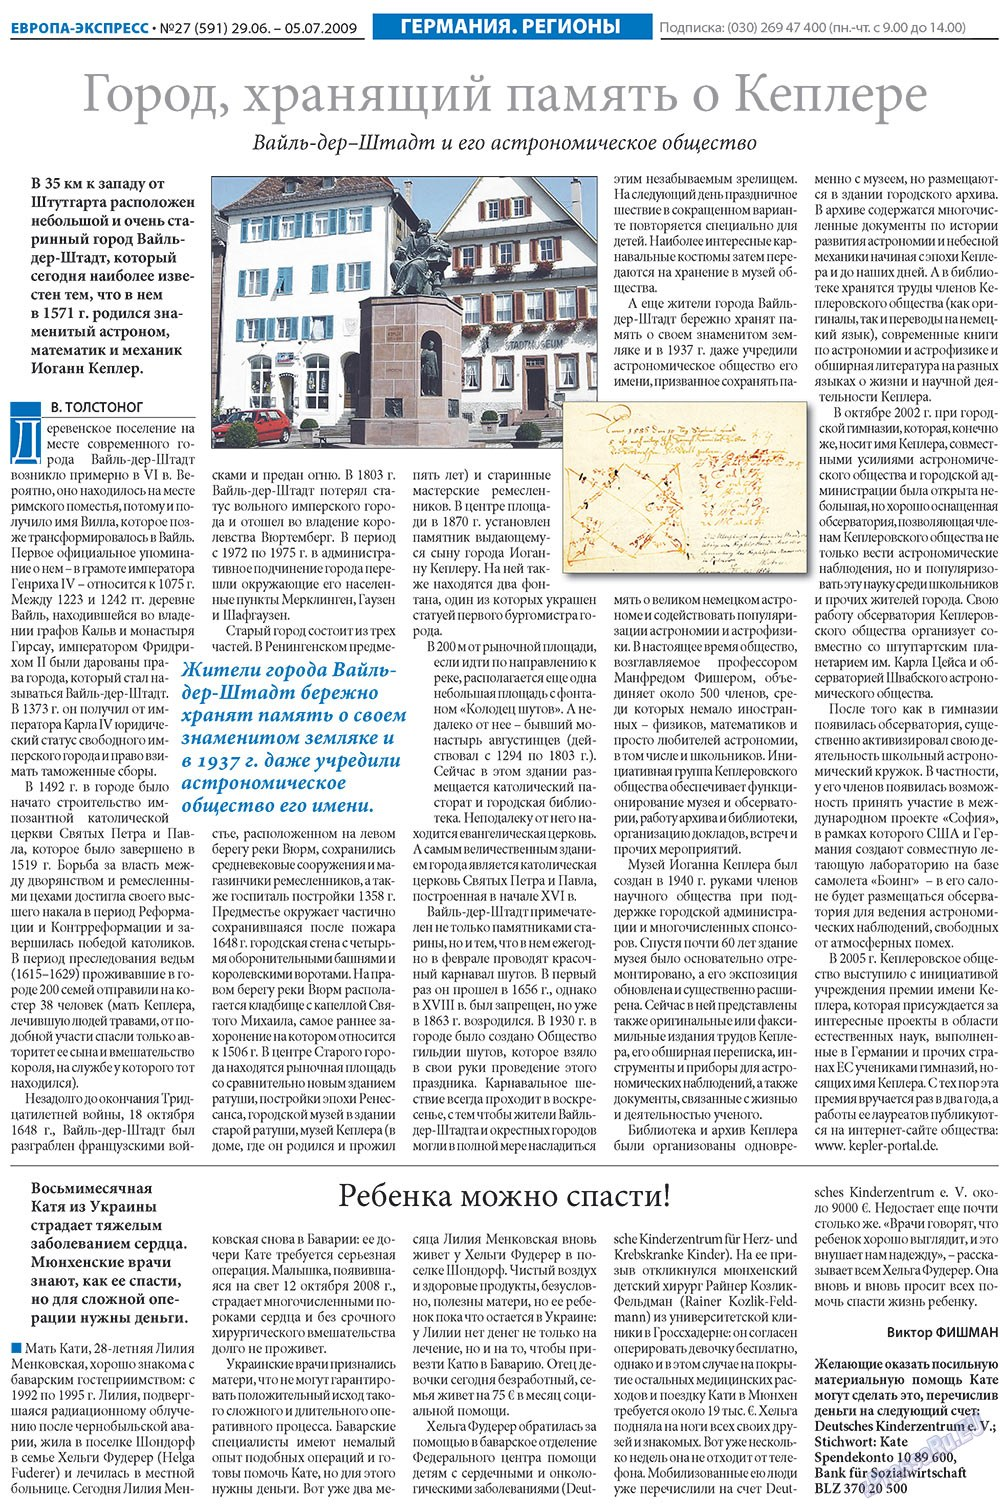 Европа экспресс (газета). 2009 год, номер 27, стр. 7